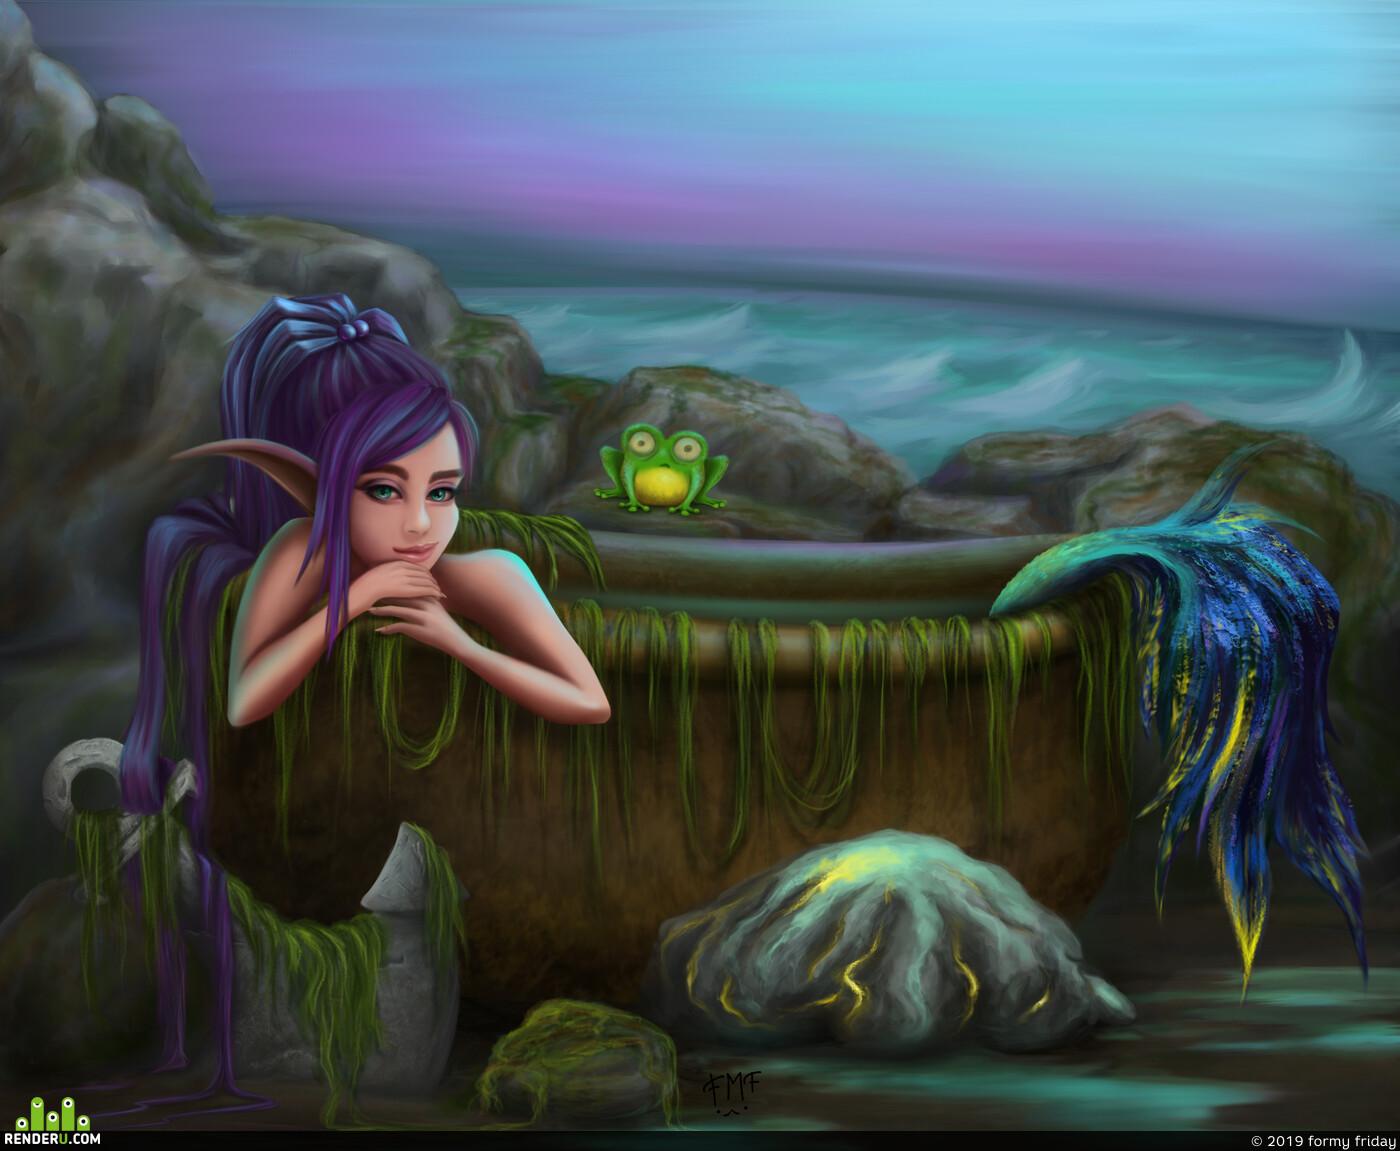 русалка, море, скалы, Фэнтезиморе, лягушка, гипножаба, нимфа